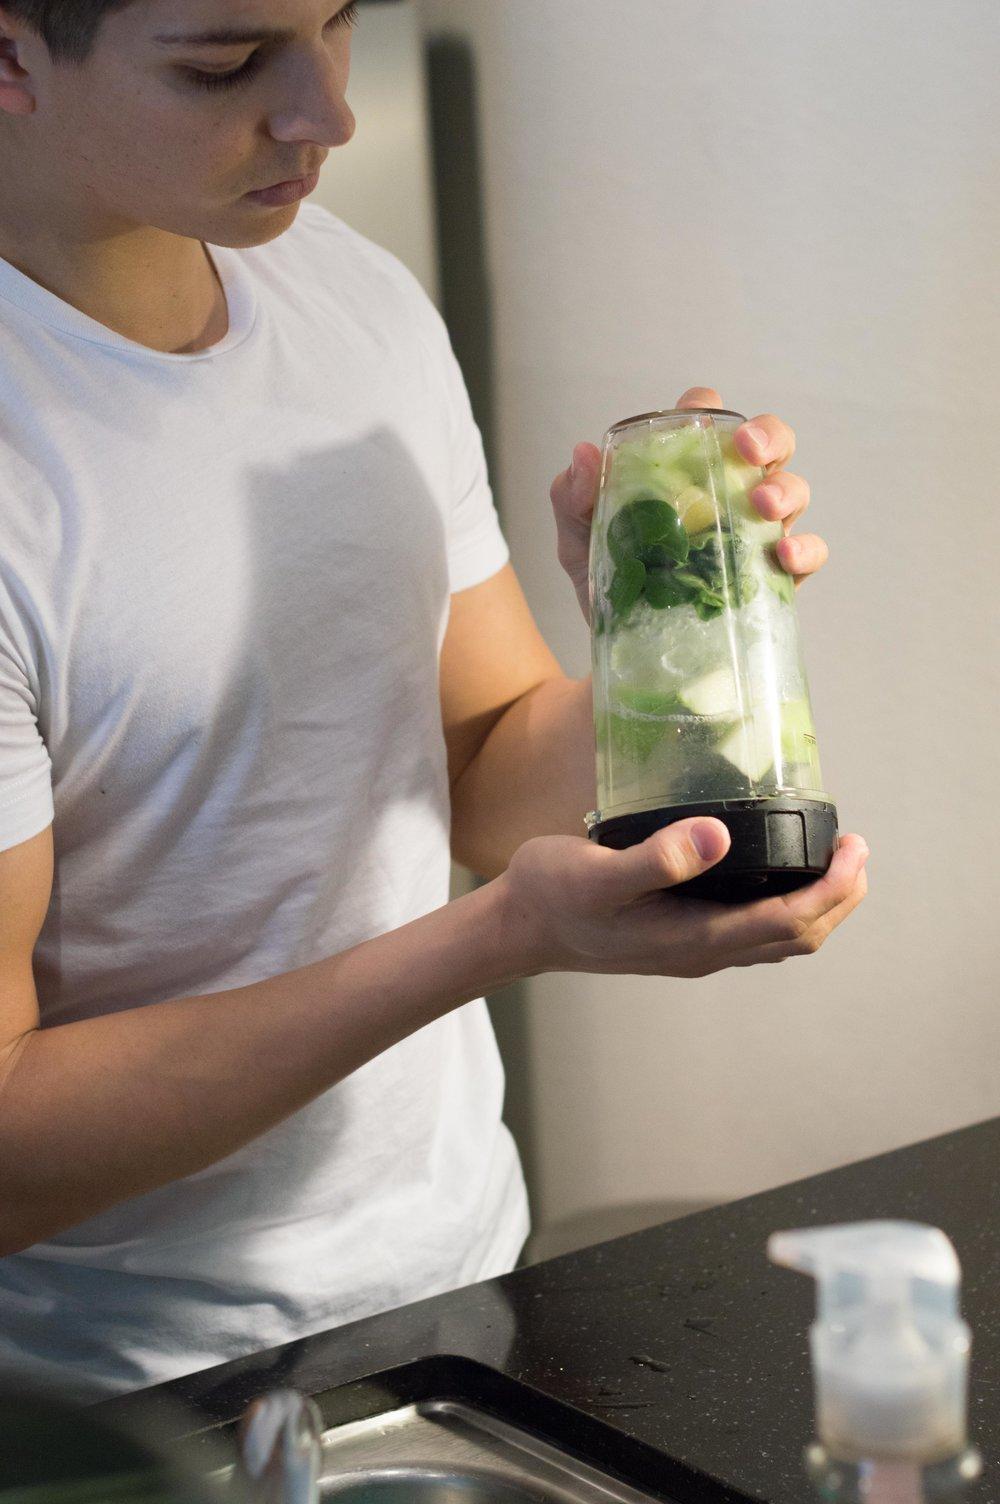 nutri-ninja-juice-recipe.jpg